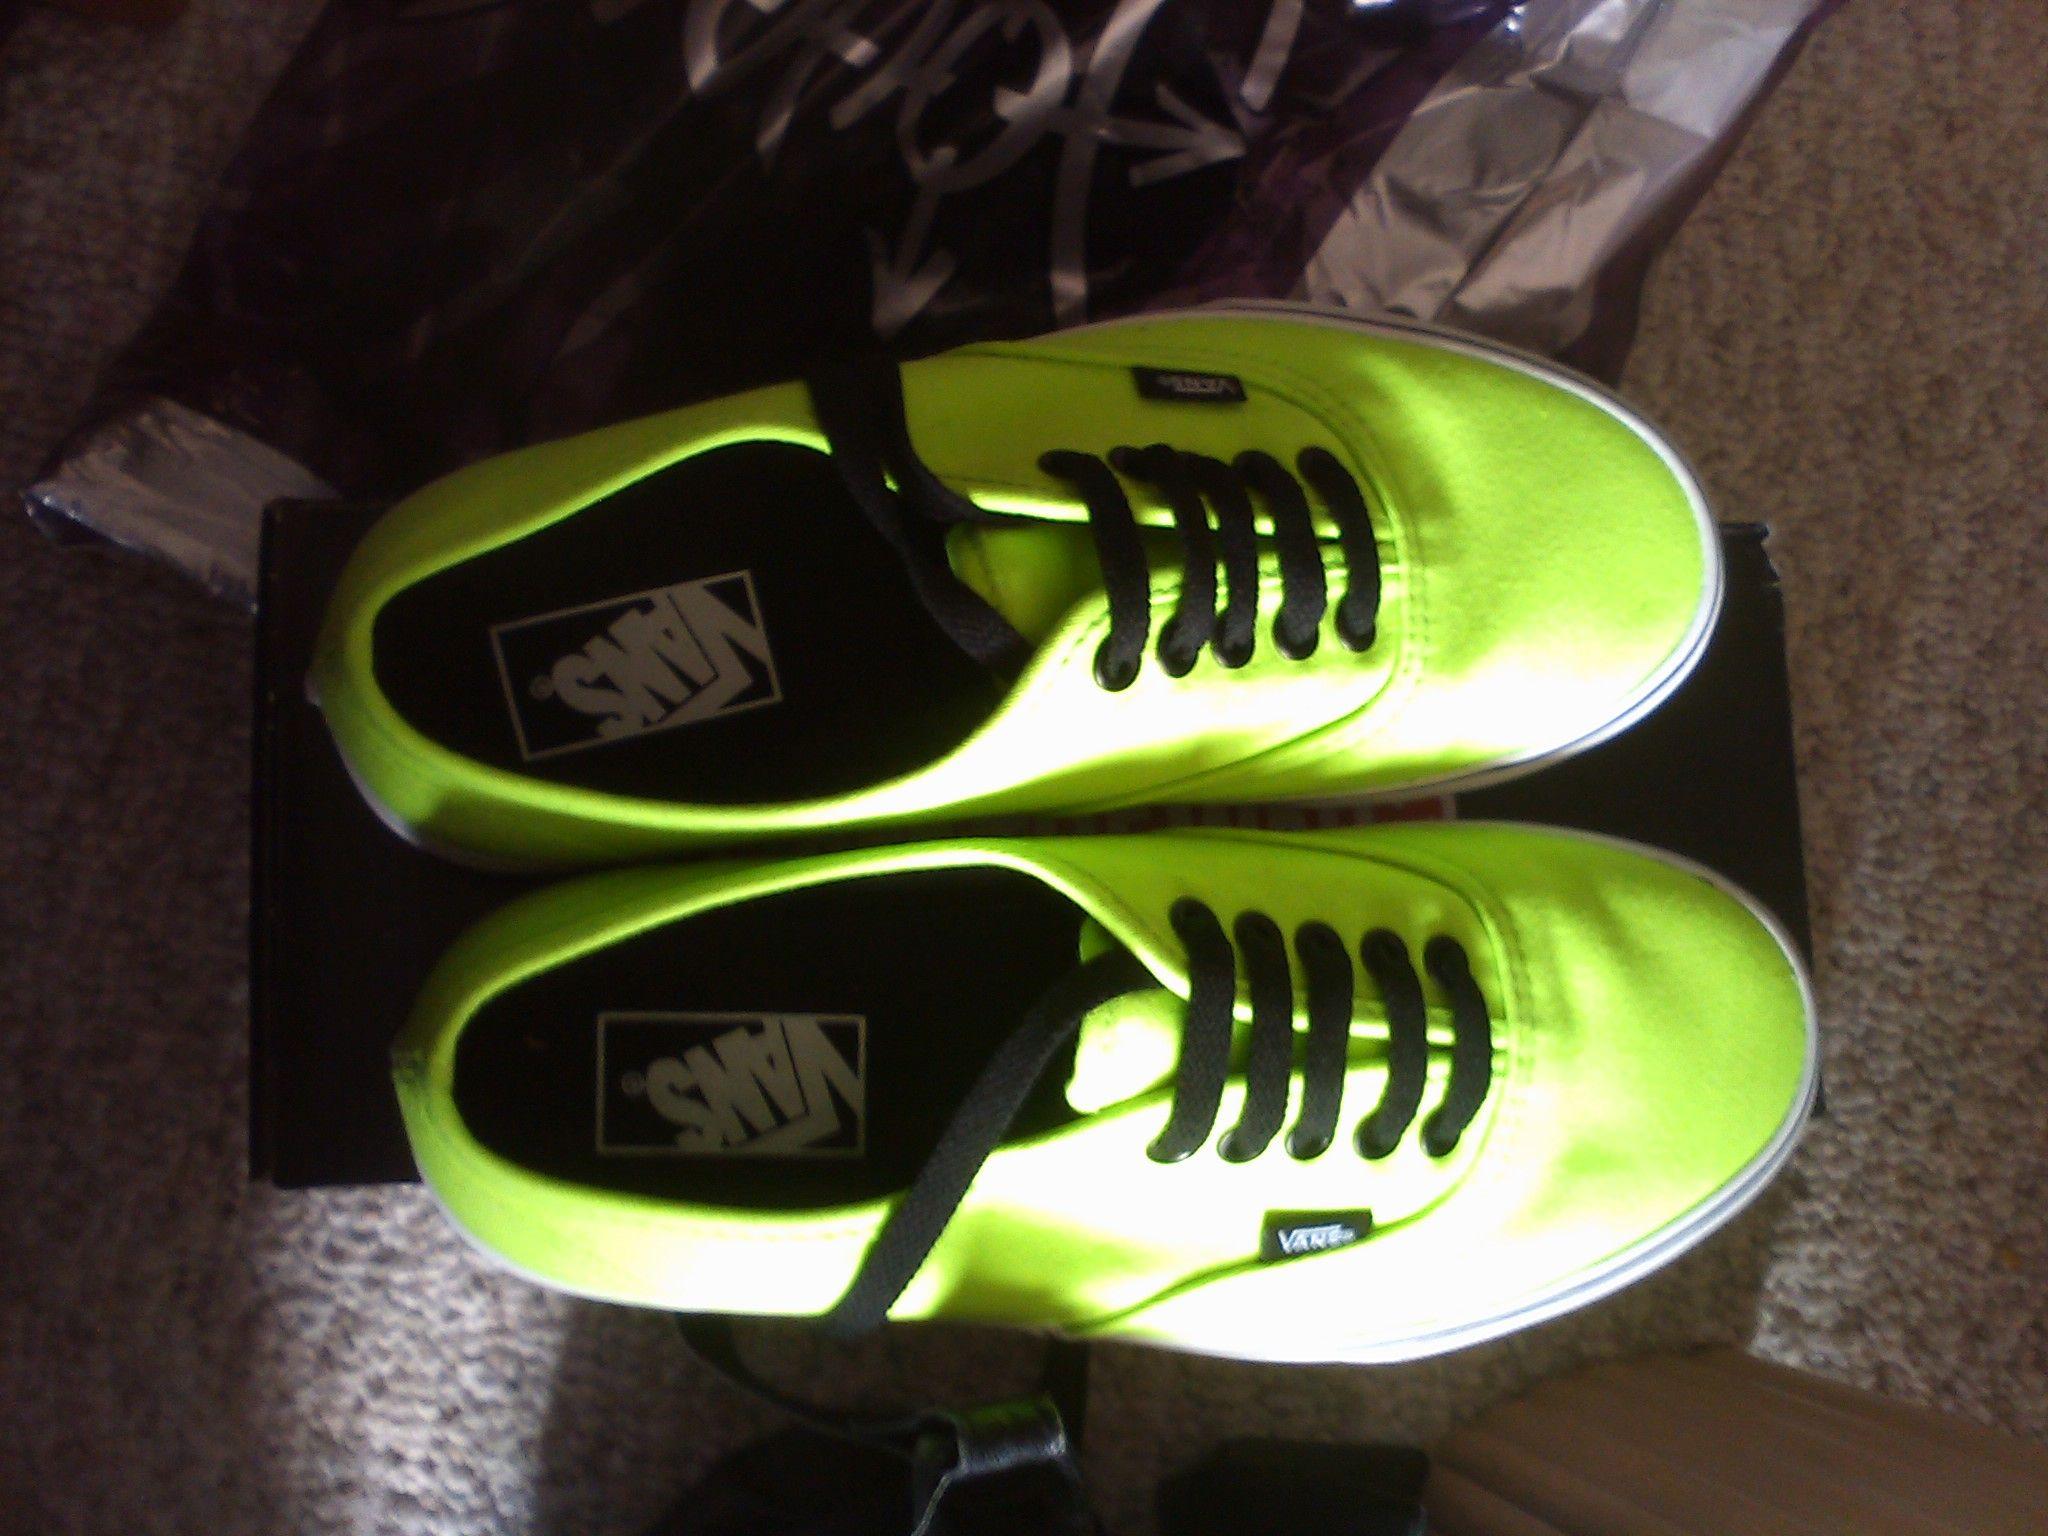 Sick kicks (for the ladies) neon edition  [round 1]